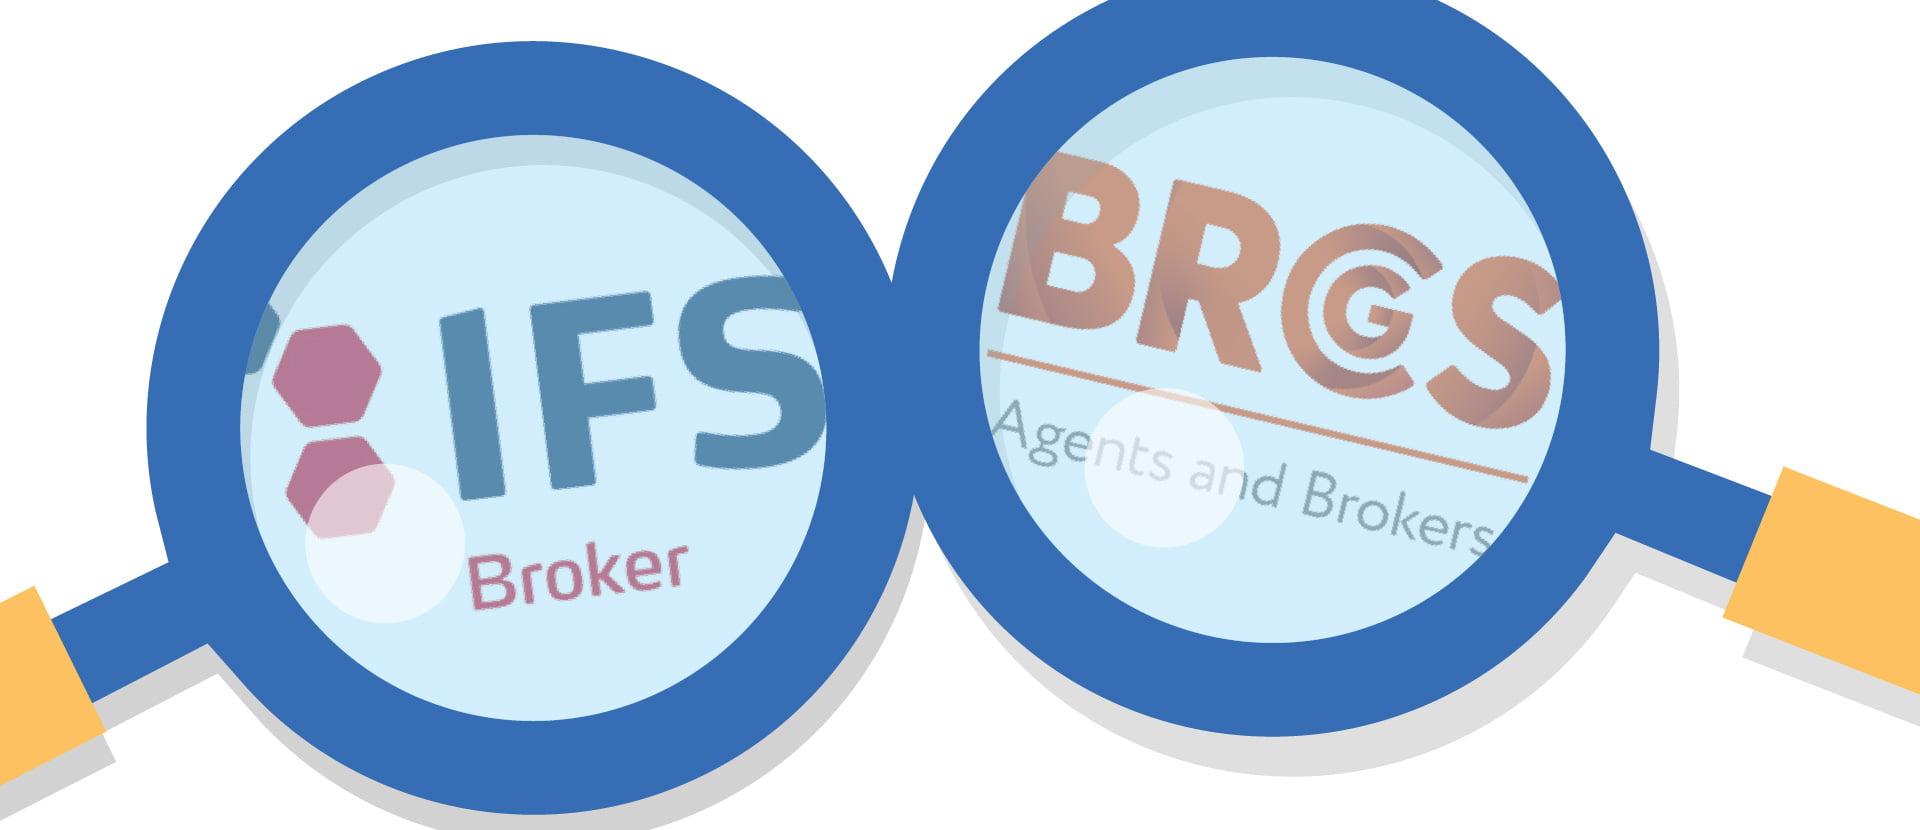 BRCGS Agents & Brokers vs IFS Broker